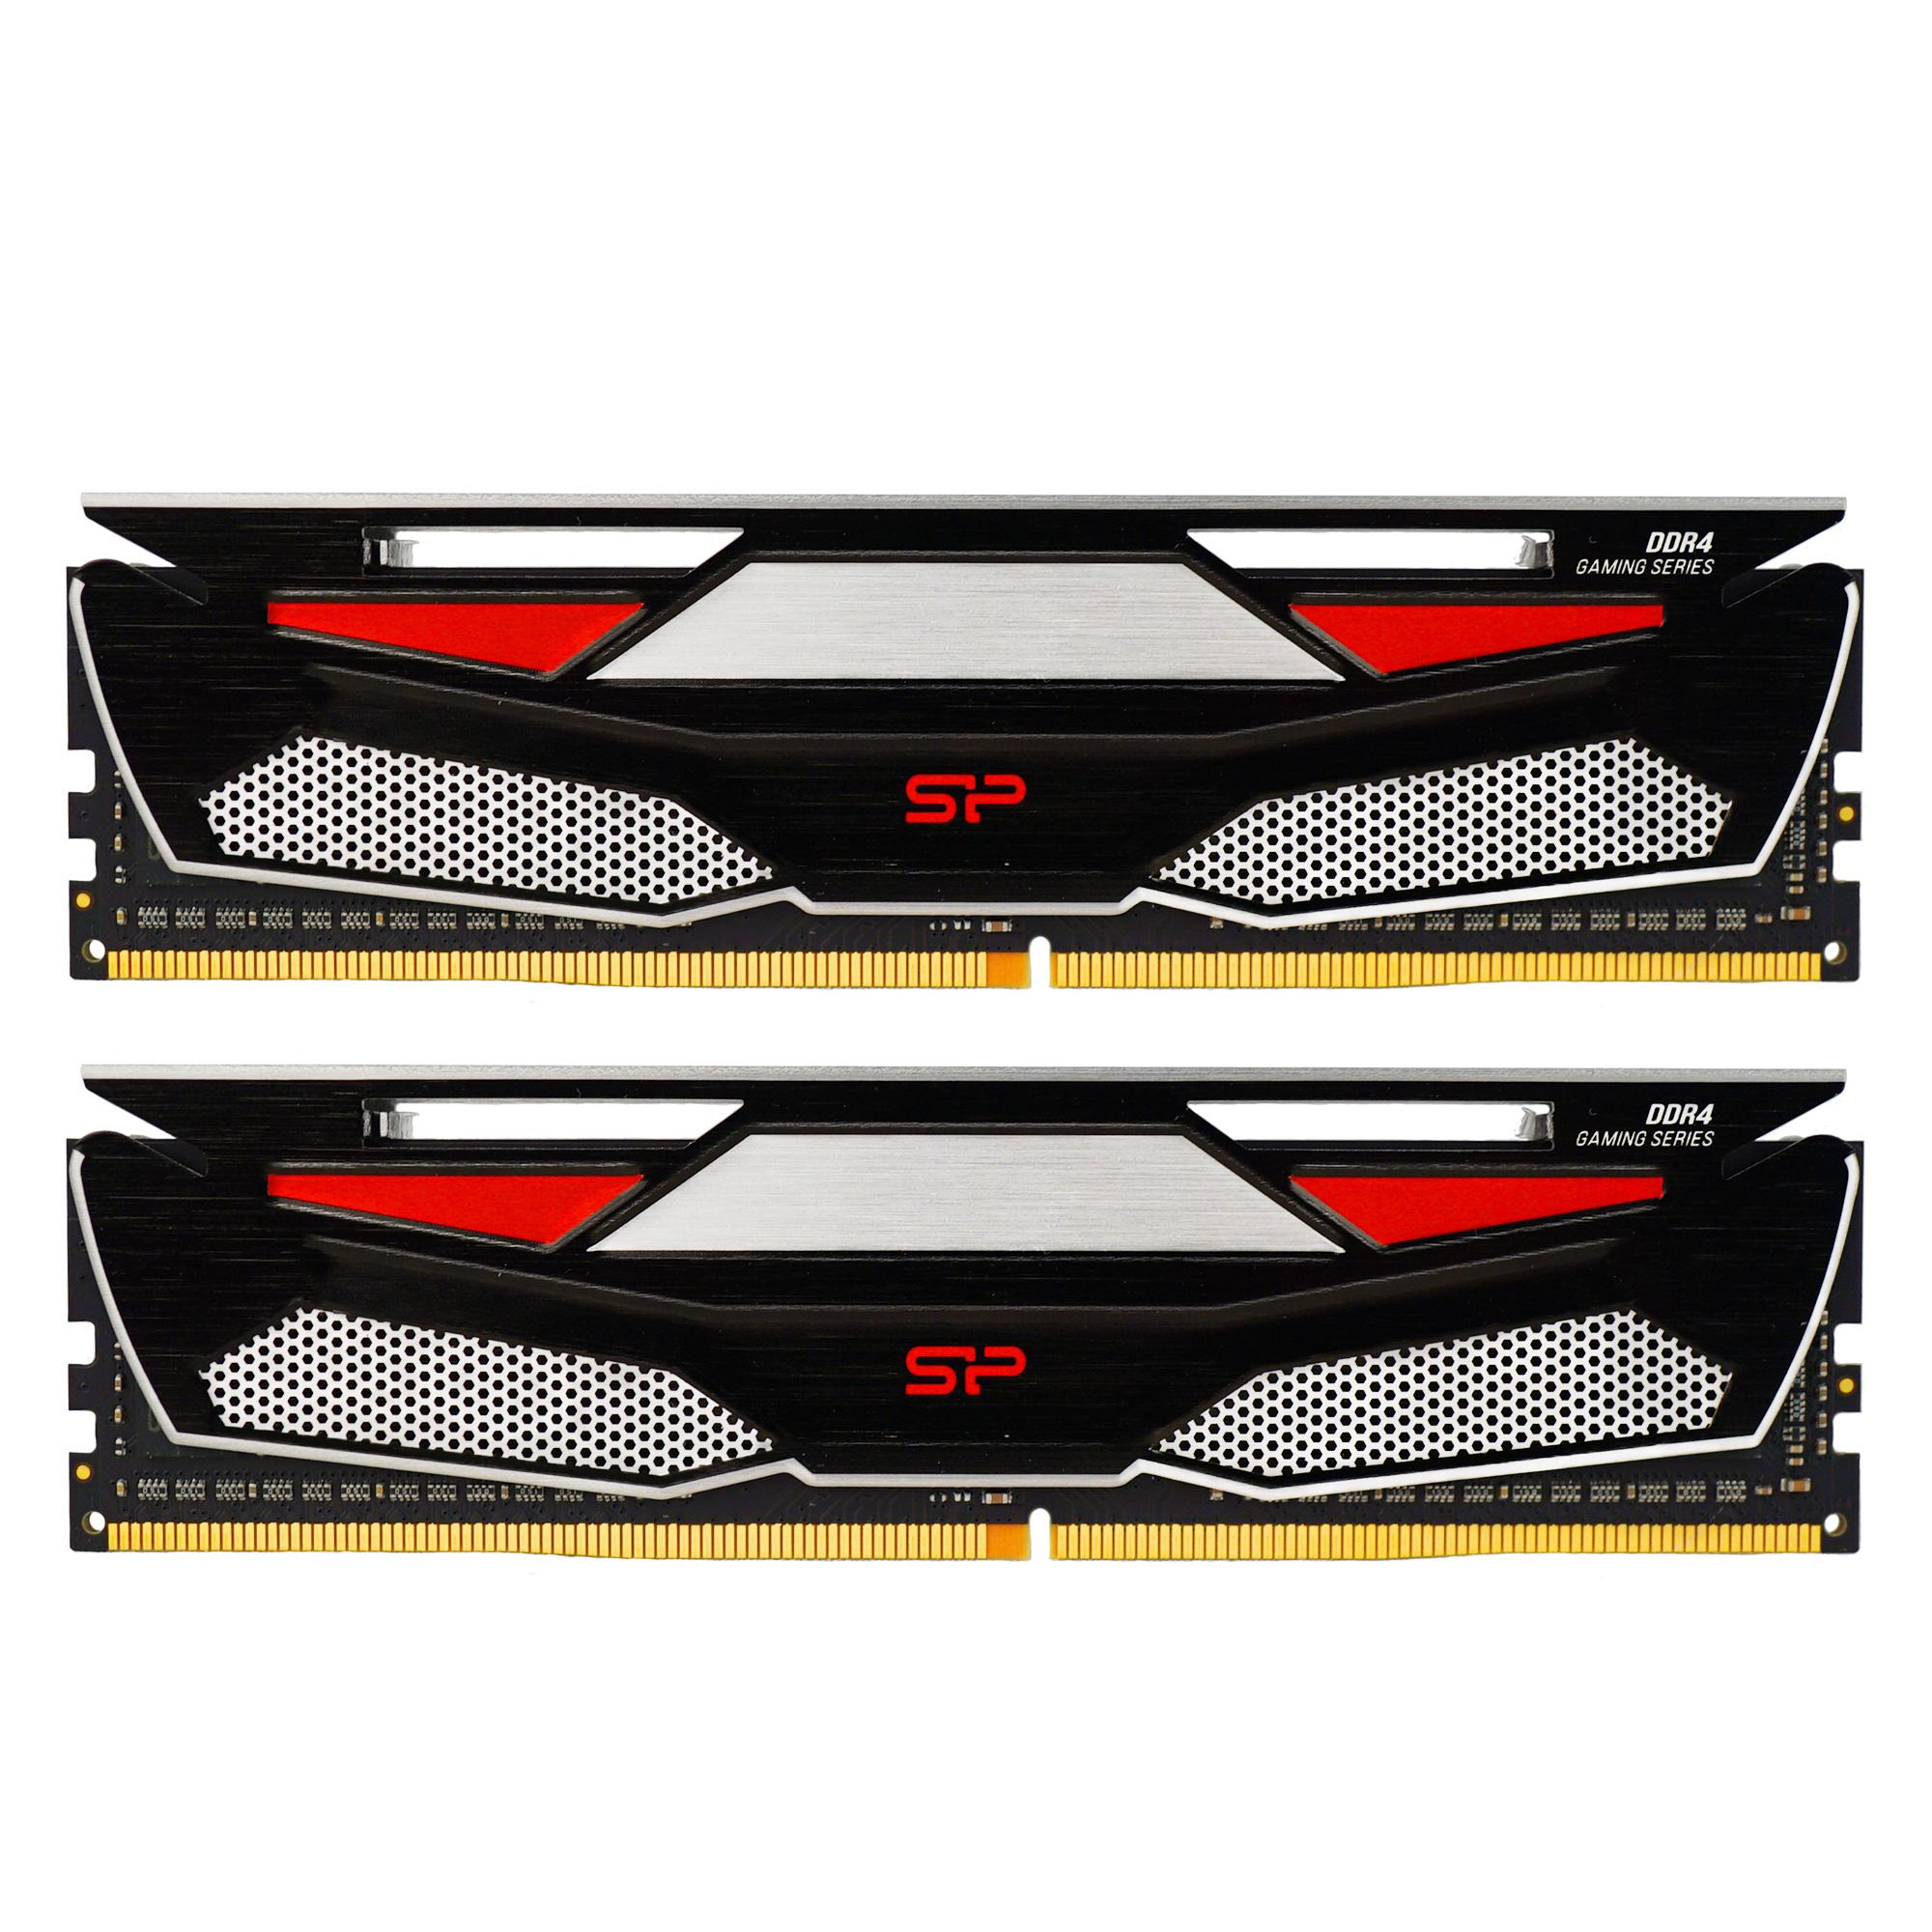 Silicon Power 16GB (2x8GB) DDR4 3600MHz Gaming Desktop Memory Desktop Memory DDR4 RAM